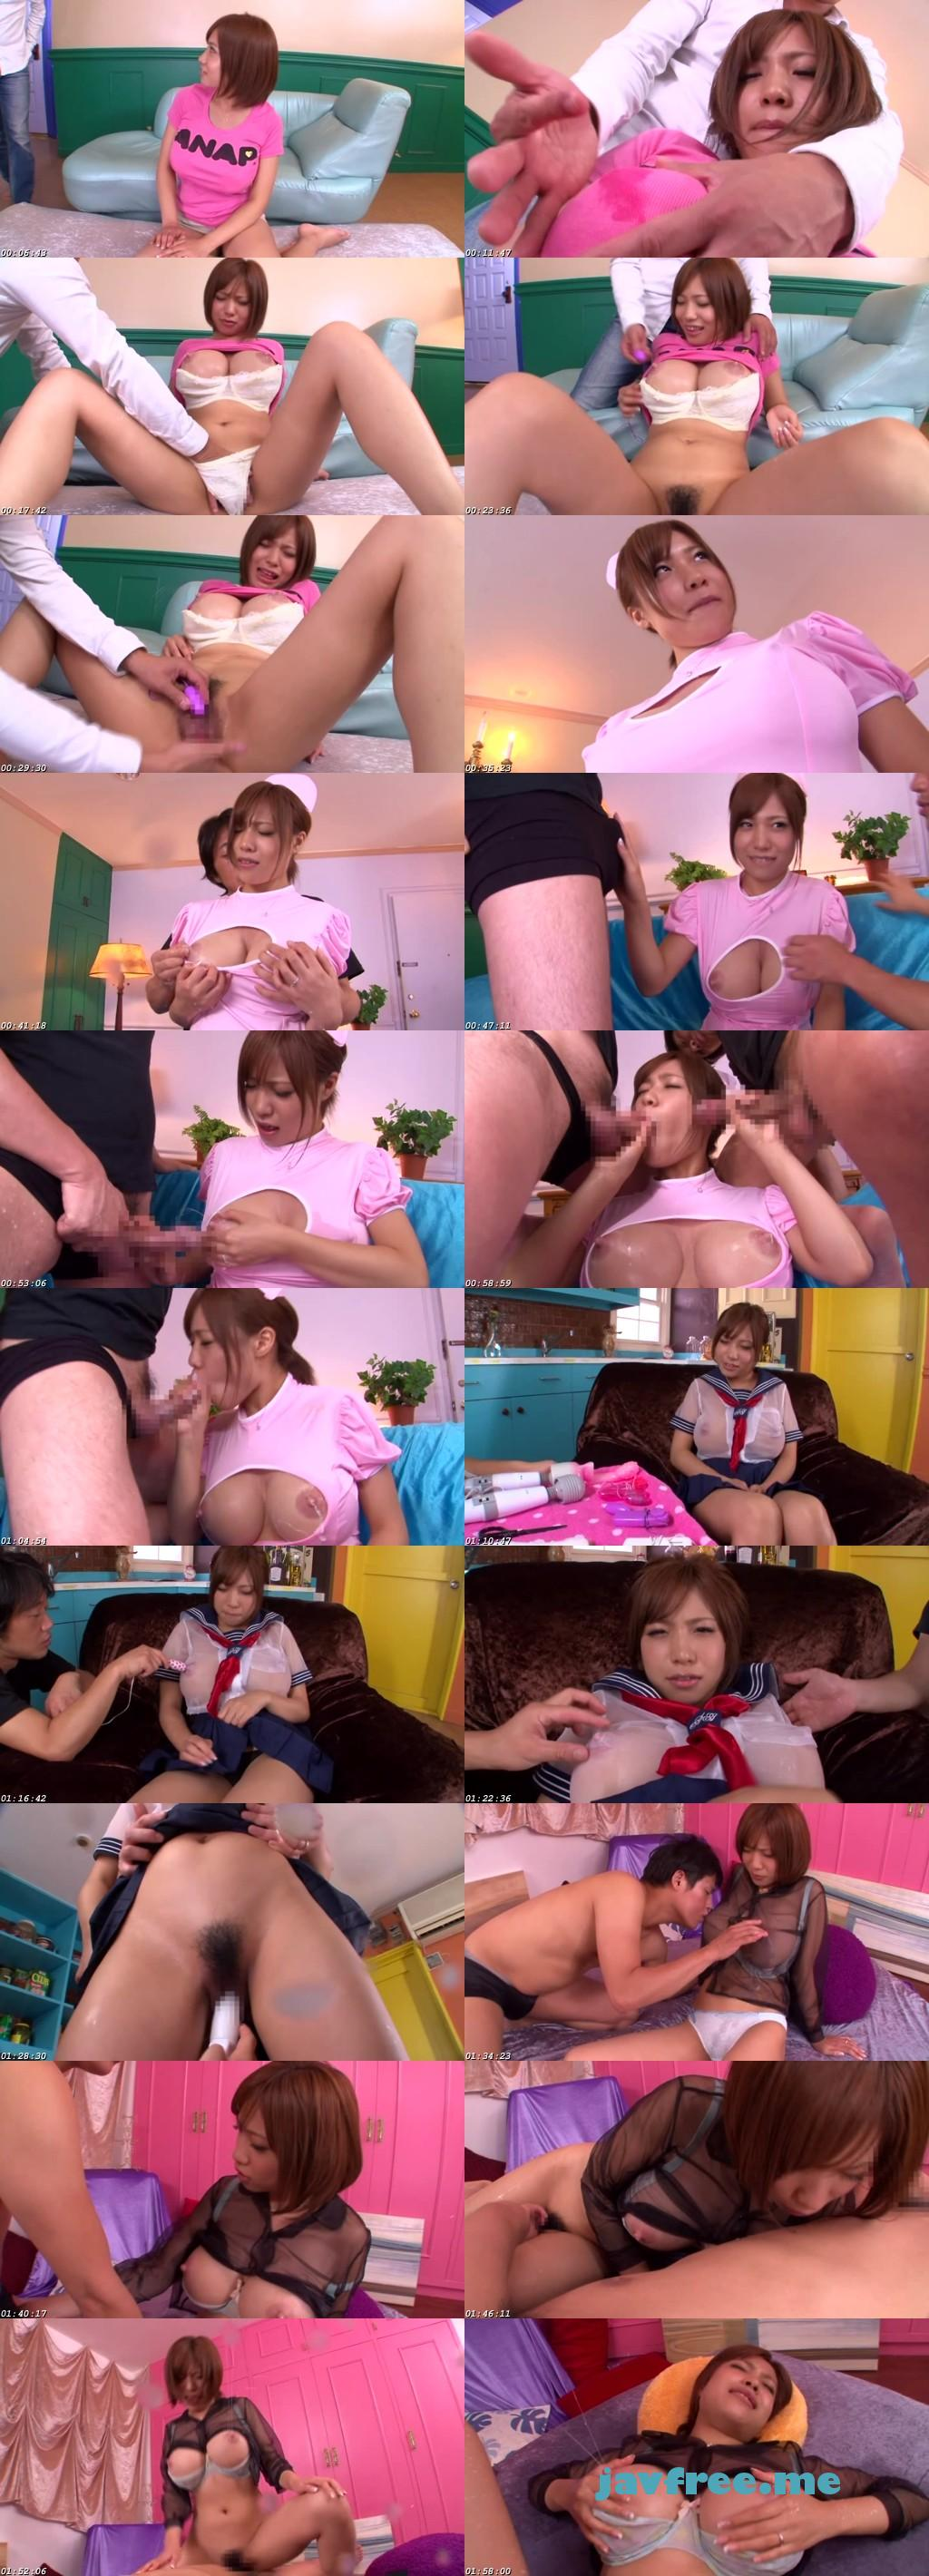 [RKI 216] 世界で一番母乳が出る女の子 三宿まゆ 三宿まゆ RKI